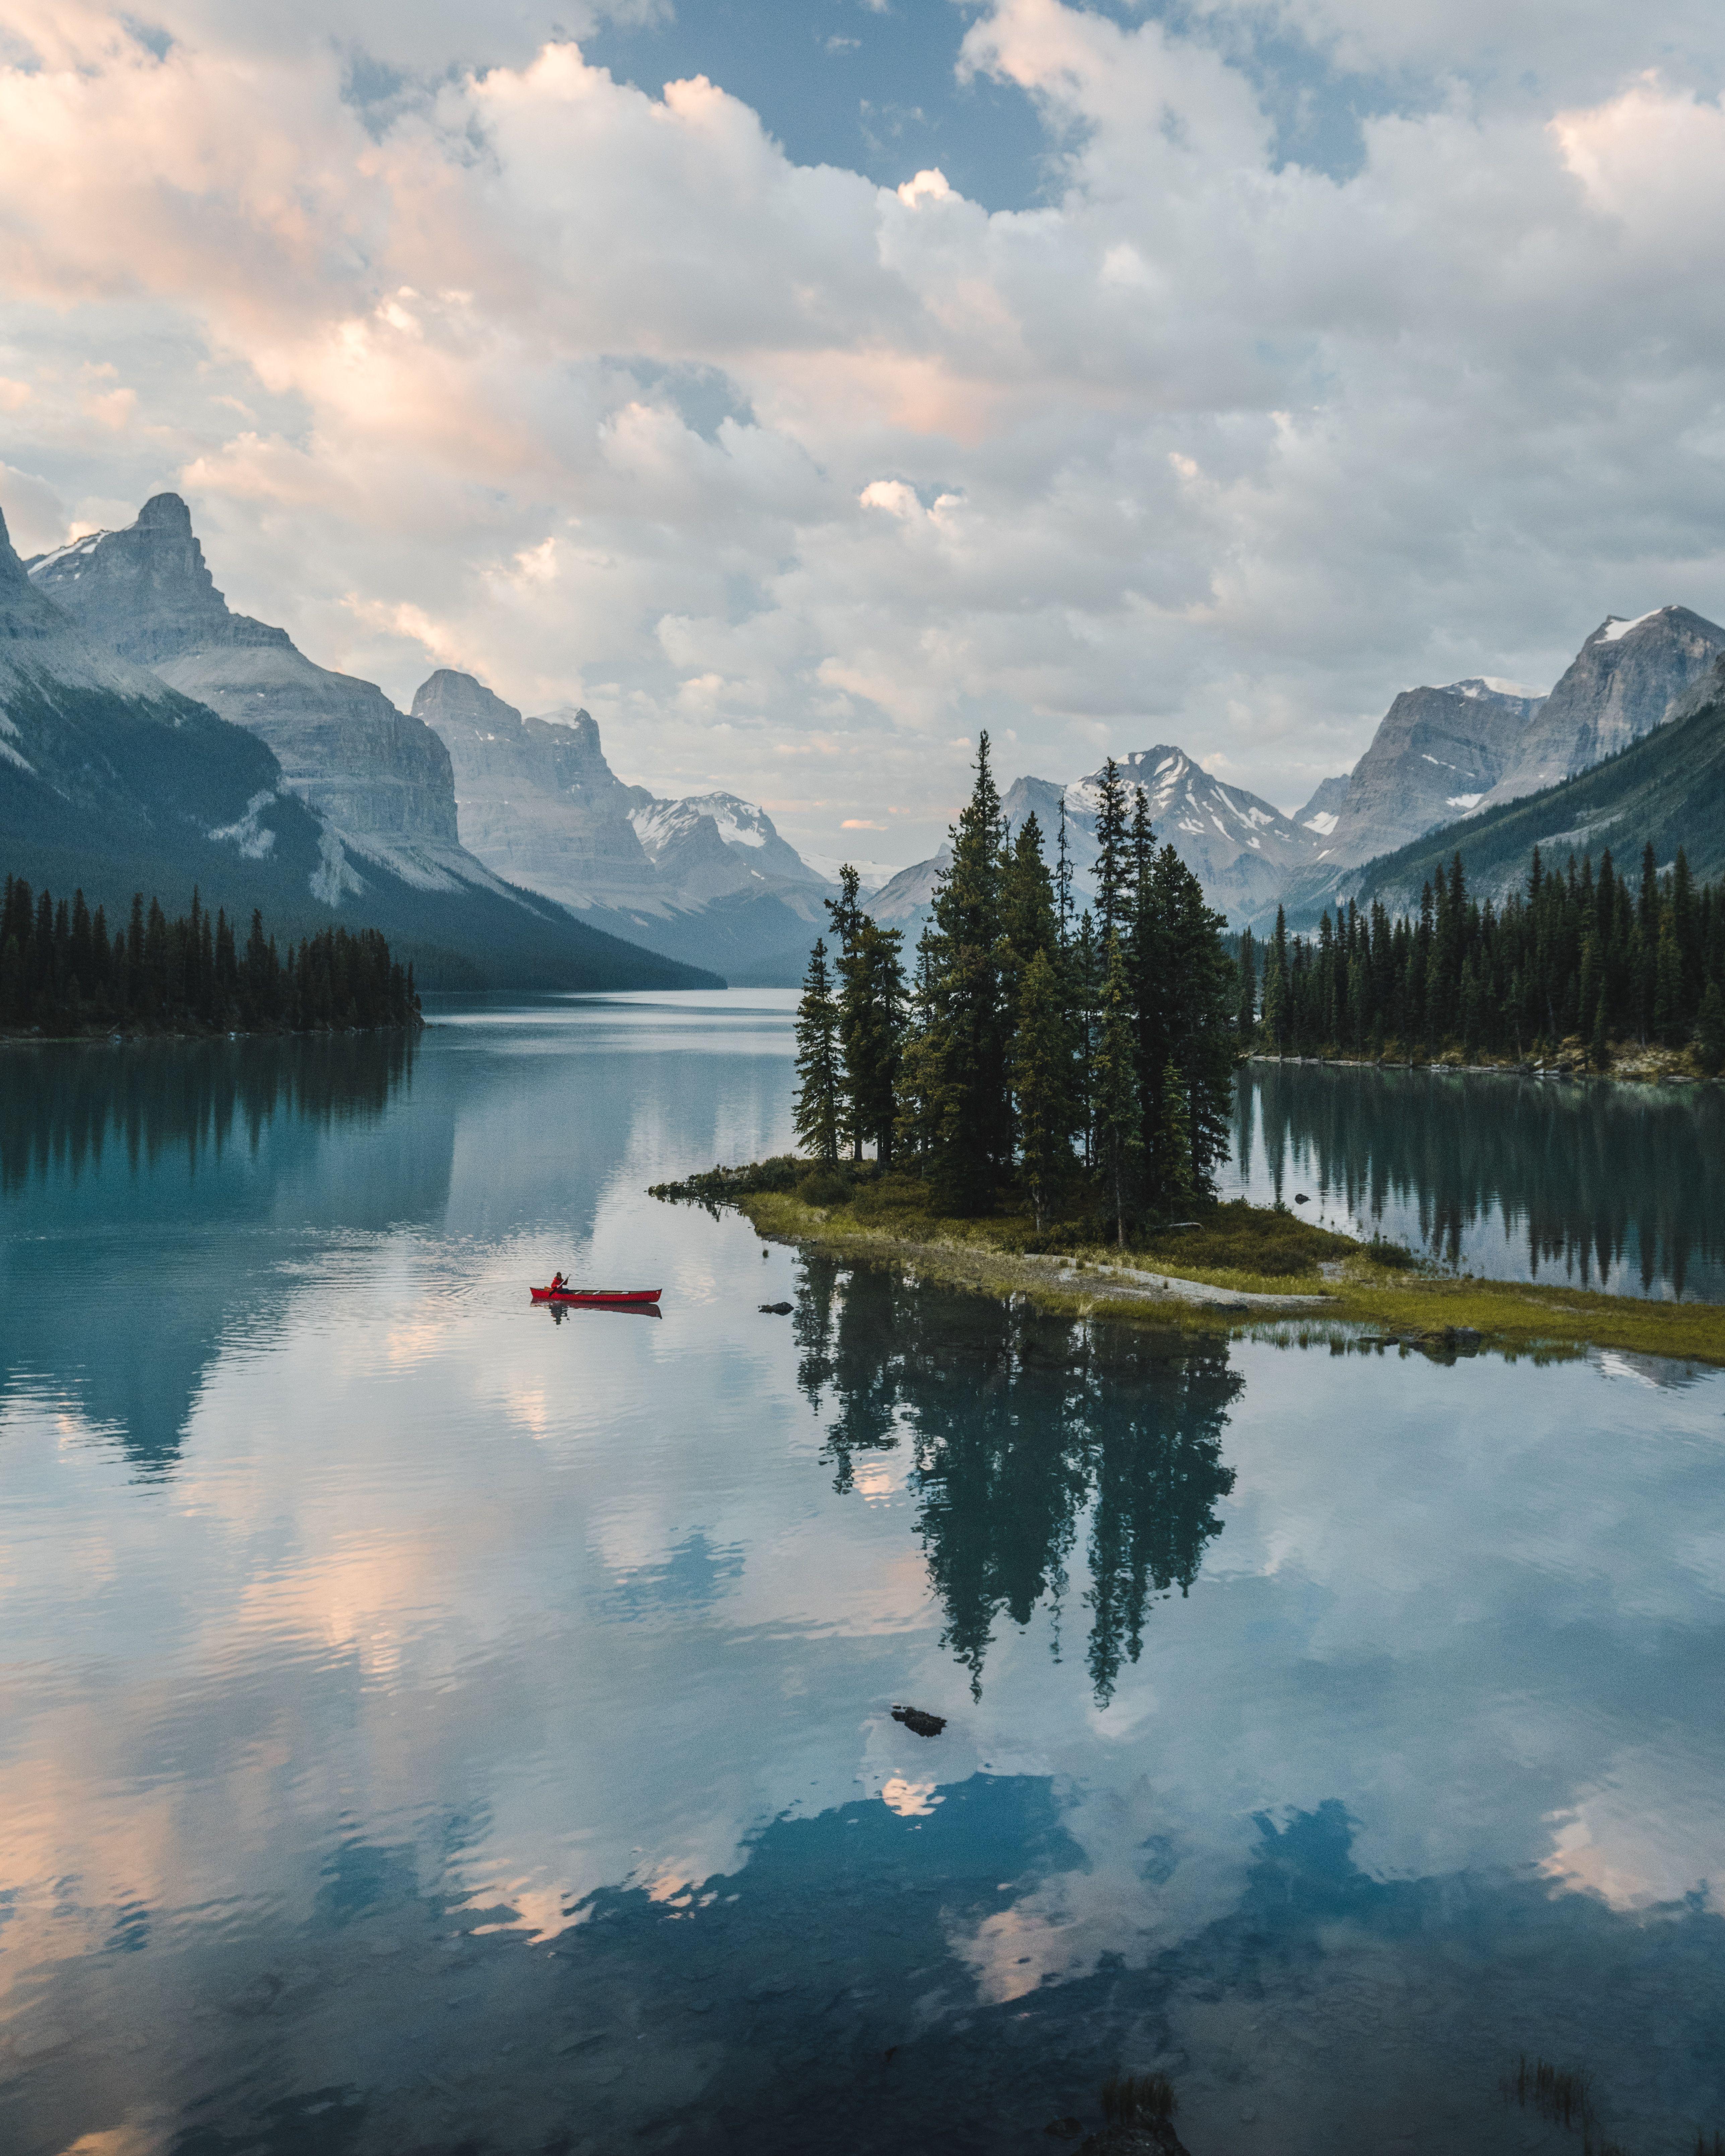 Dreamy Canadian Lake Mountain Landscape Photography Mountain Photography Canada Photography